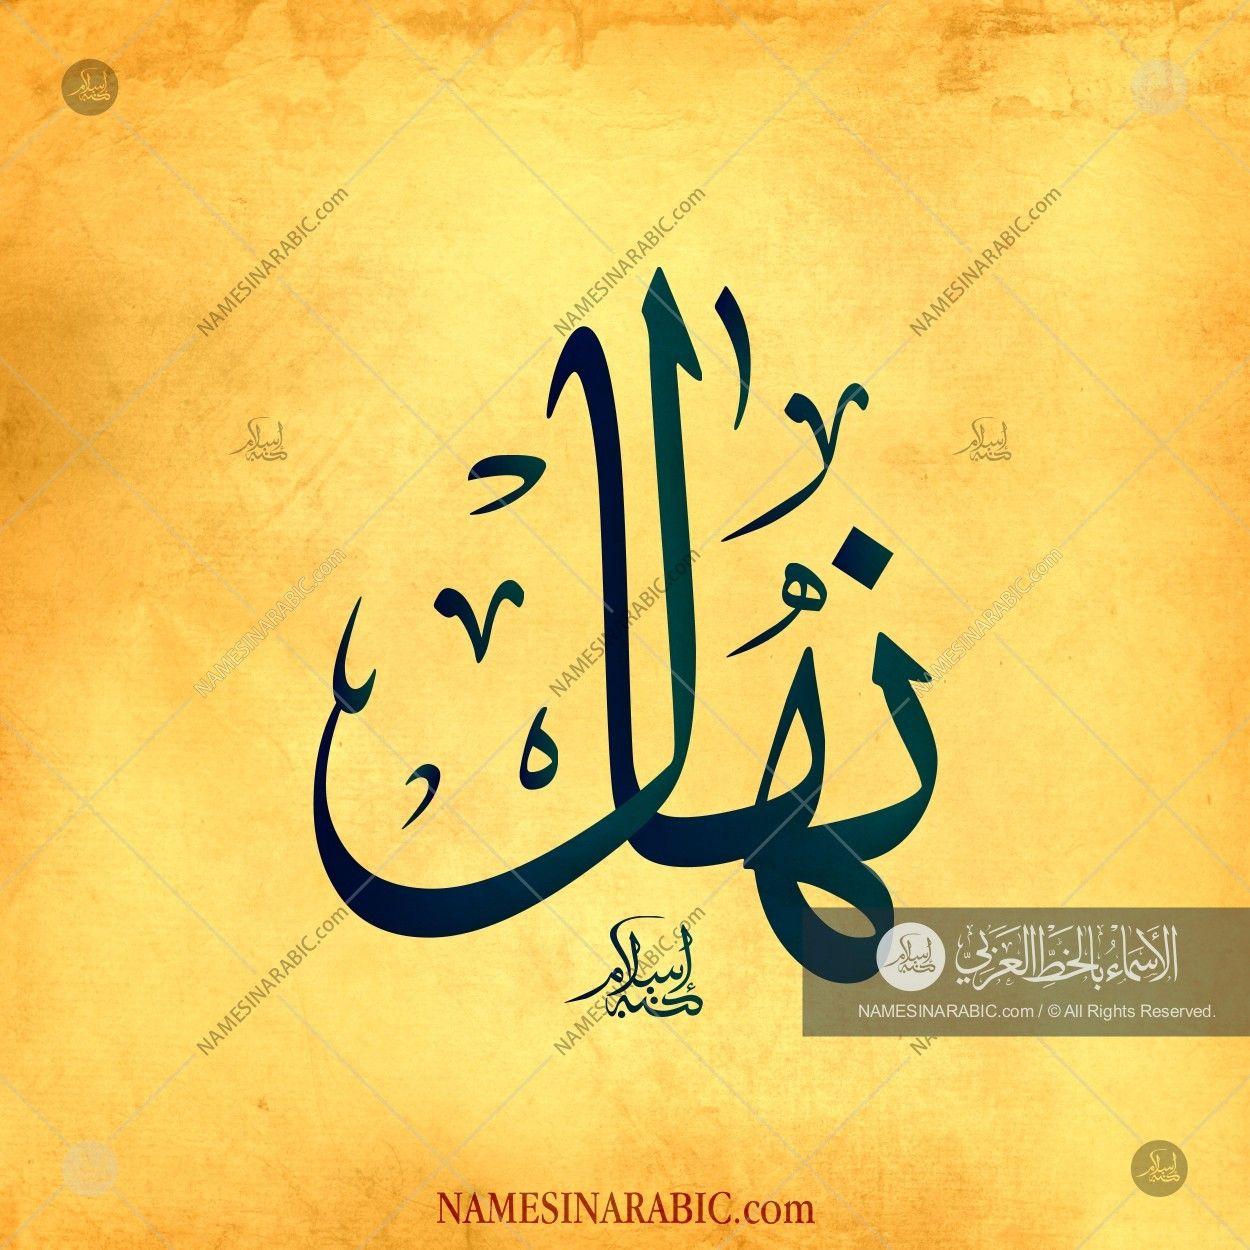 Nihal نهال Names In Arabic Calligraphy Name 2870 Calligraphy Name Calligraphy Names